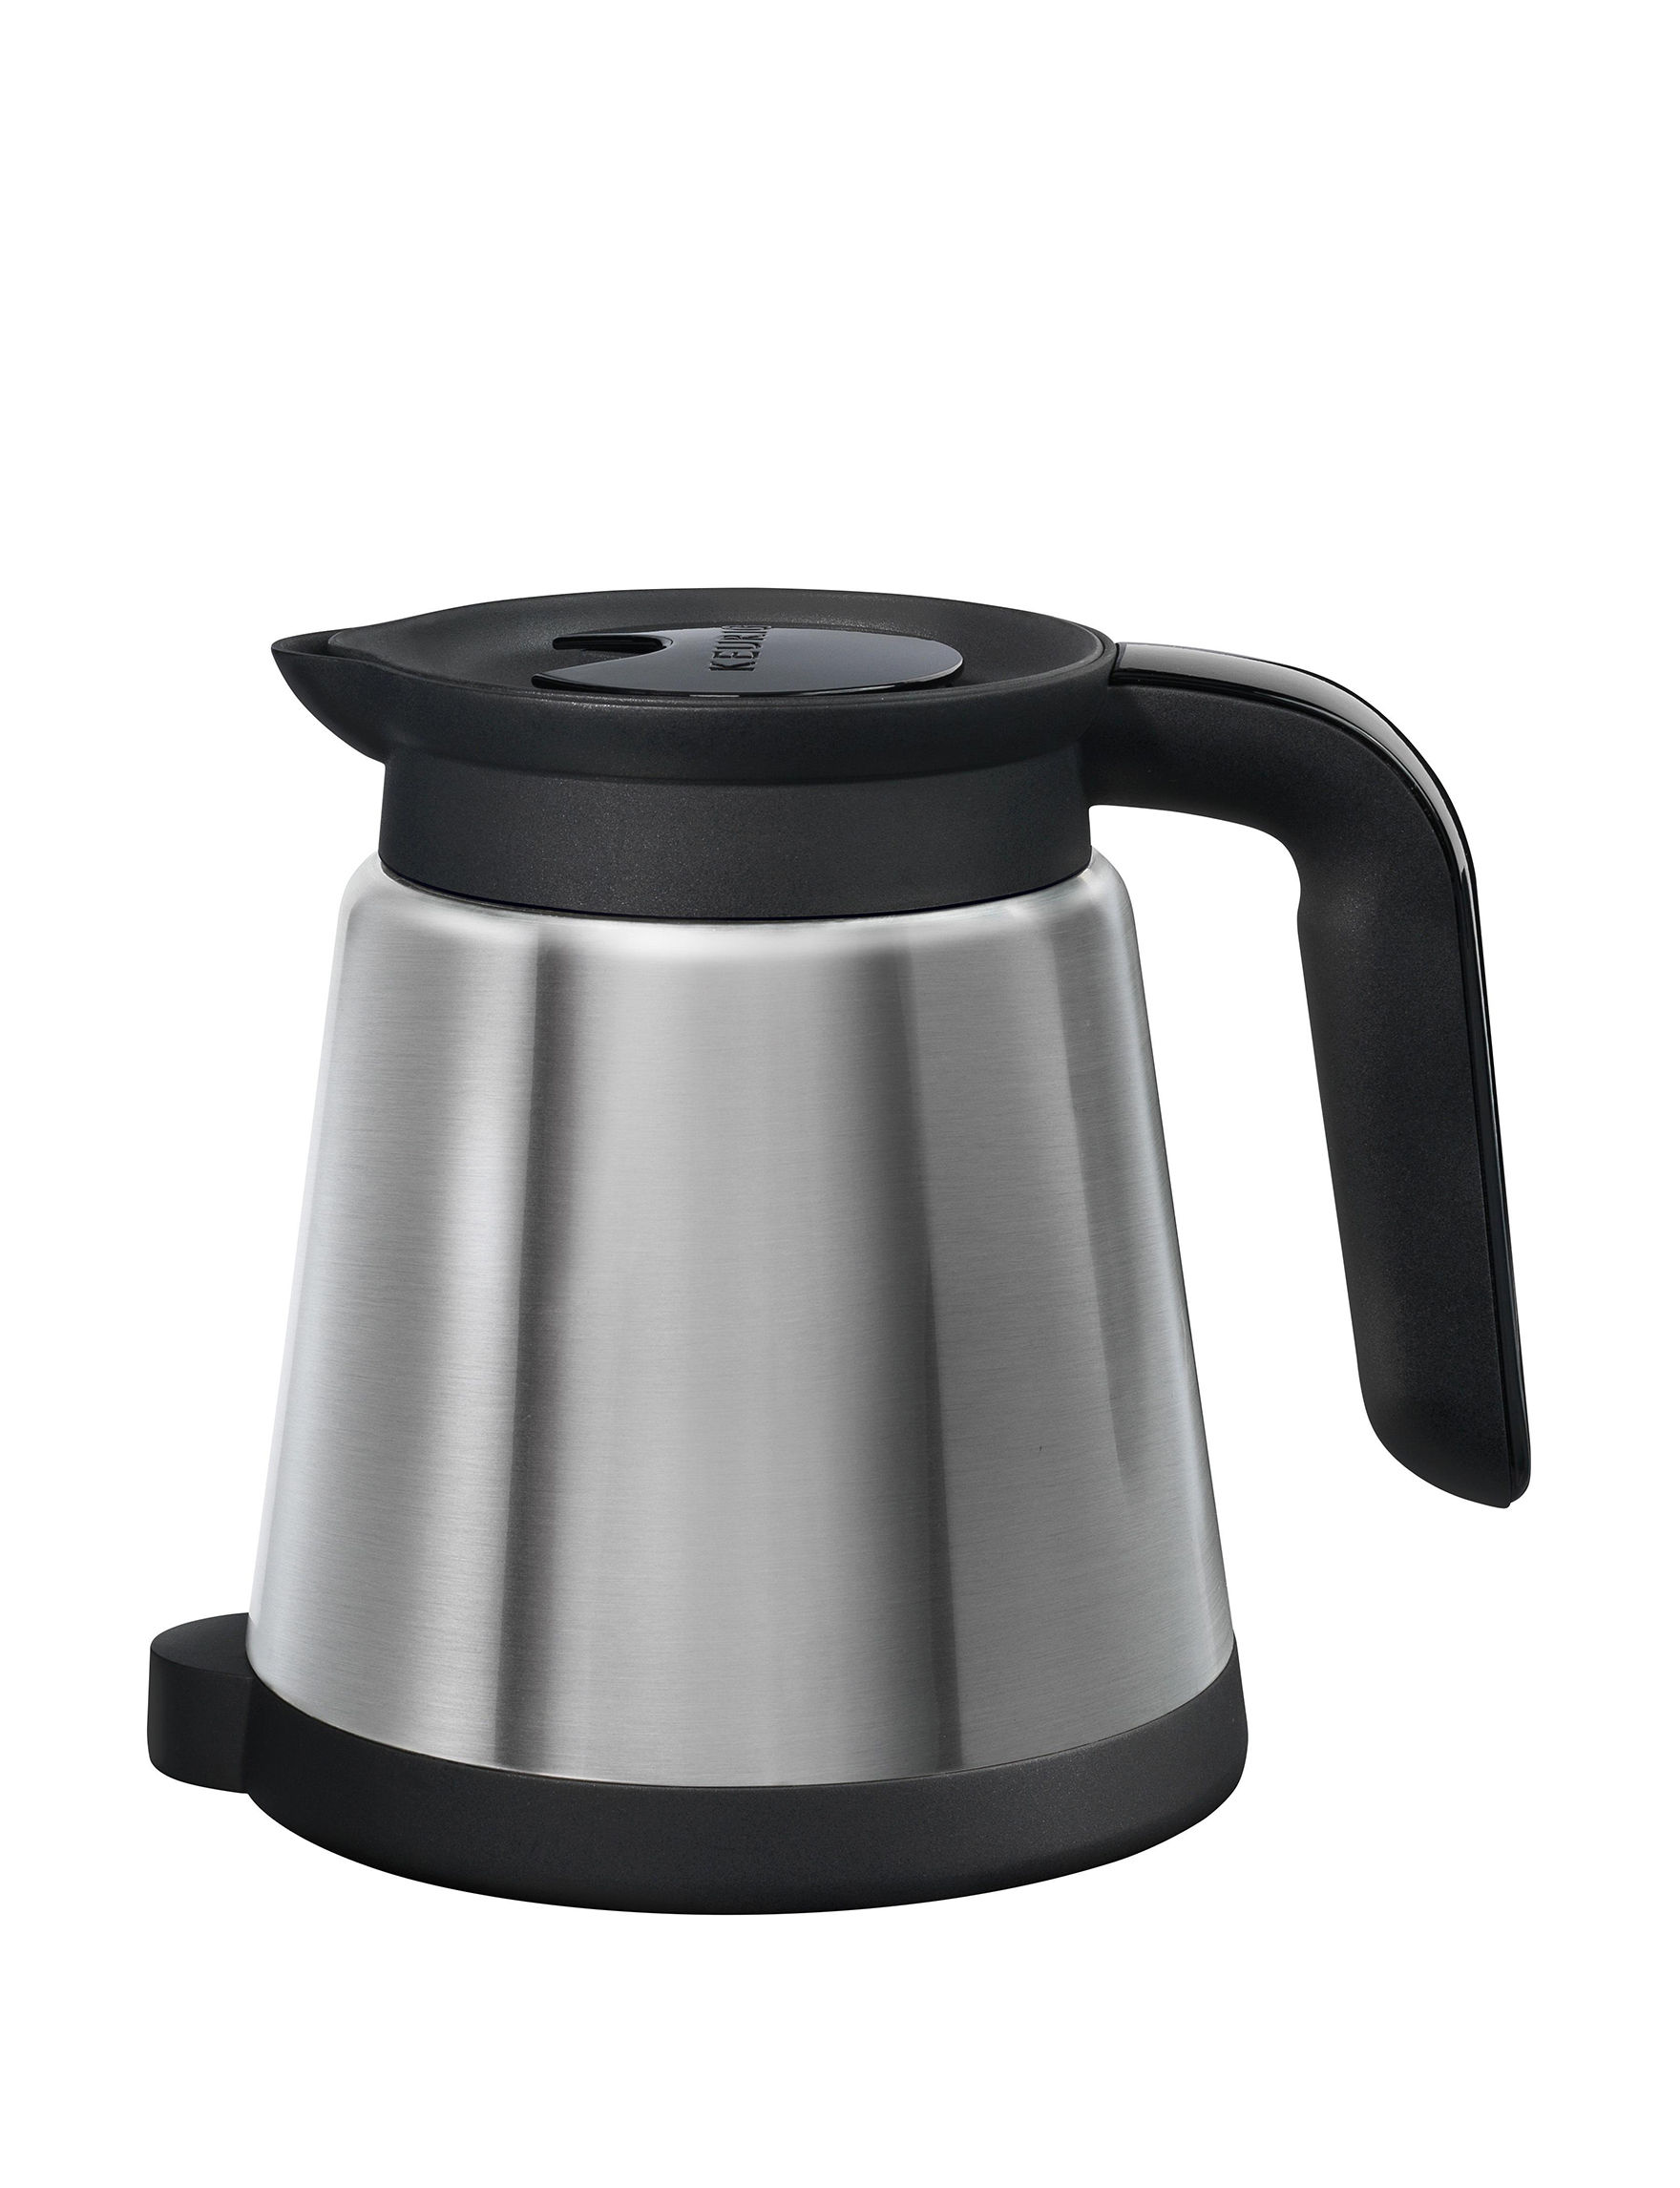 Keurig Silver Coffee, Espresso & Tea Makers Kitchen Appliances